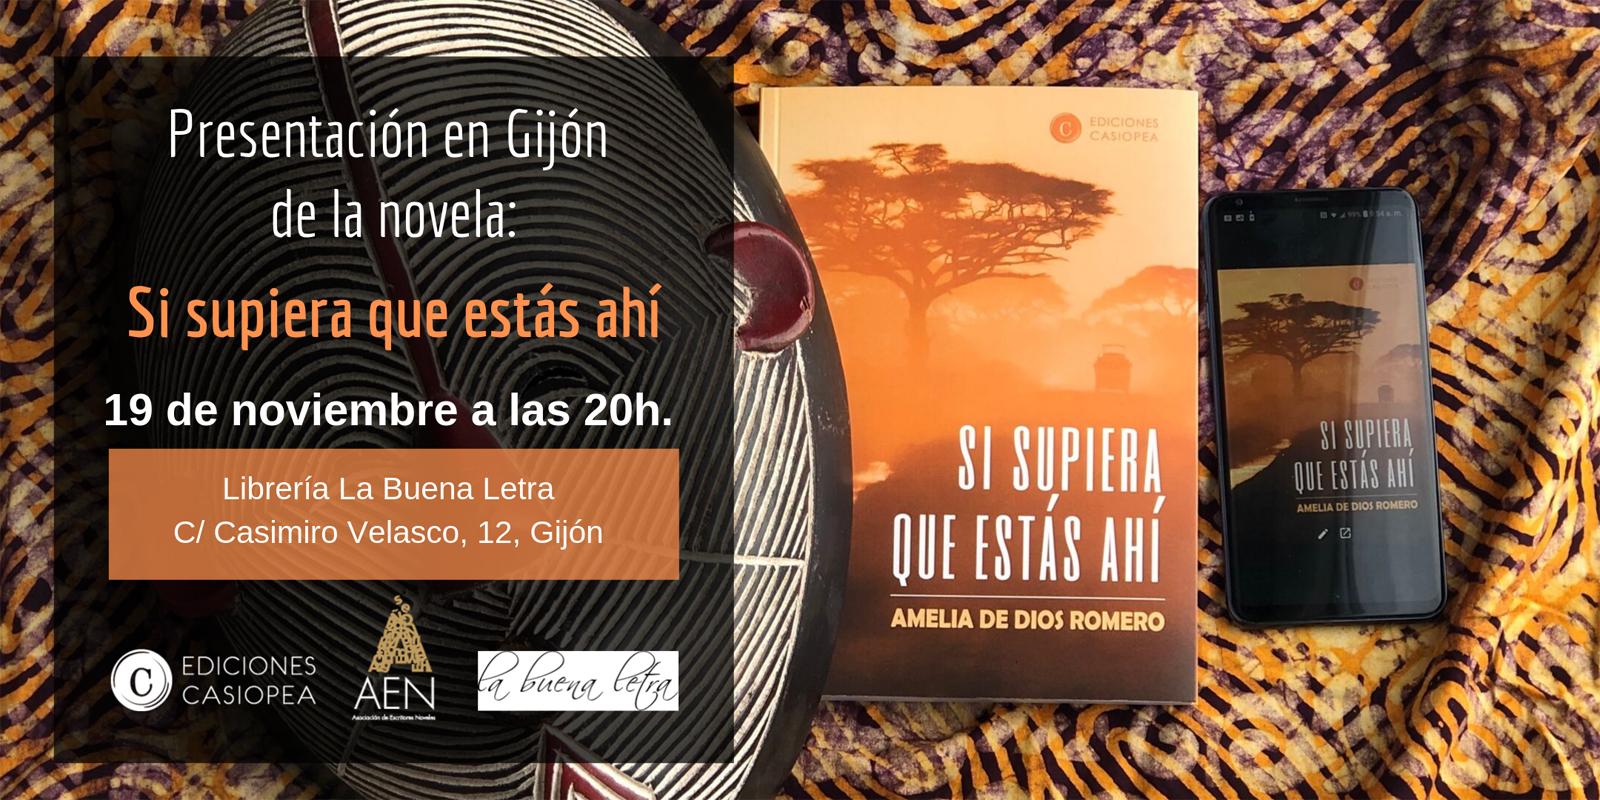 Amelia de Dios presenta en Gijón